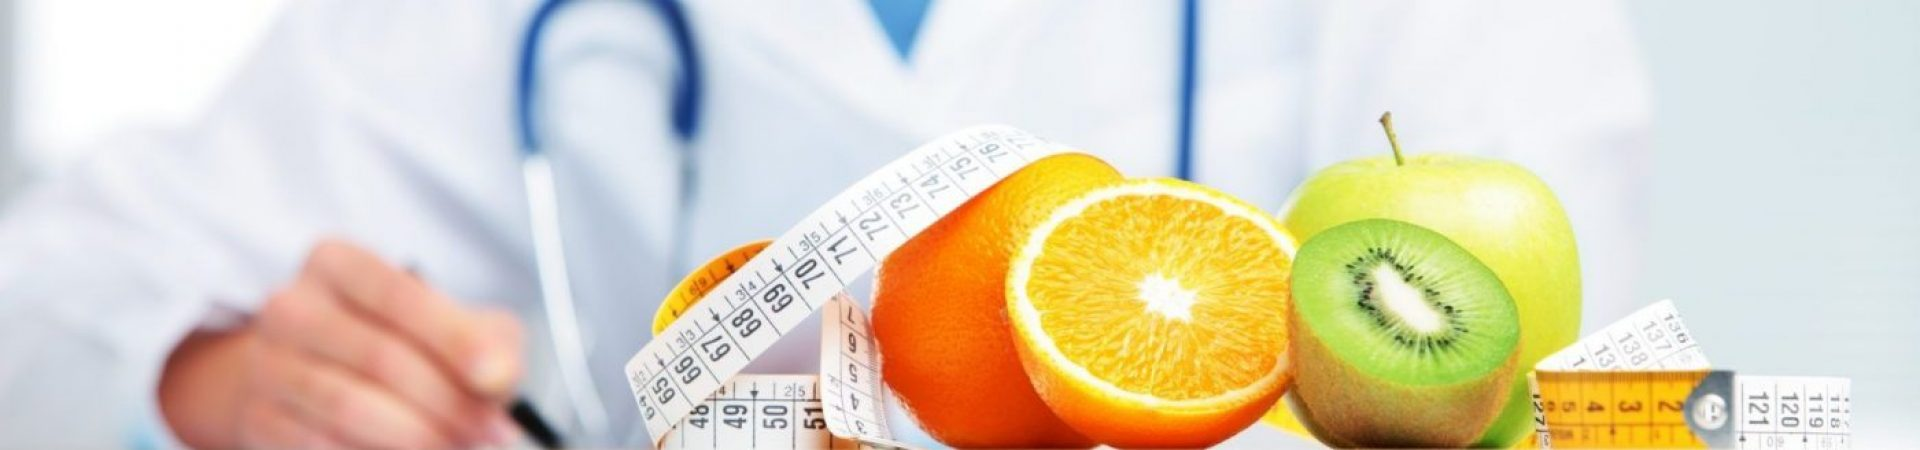 consulta de nutrición en córdoba